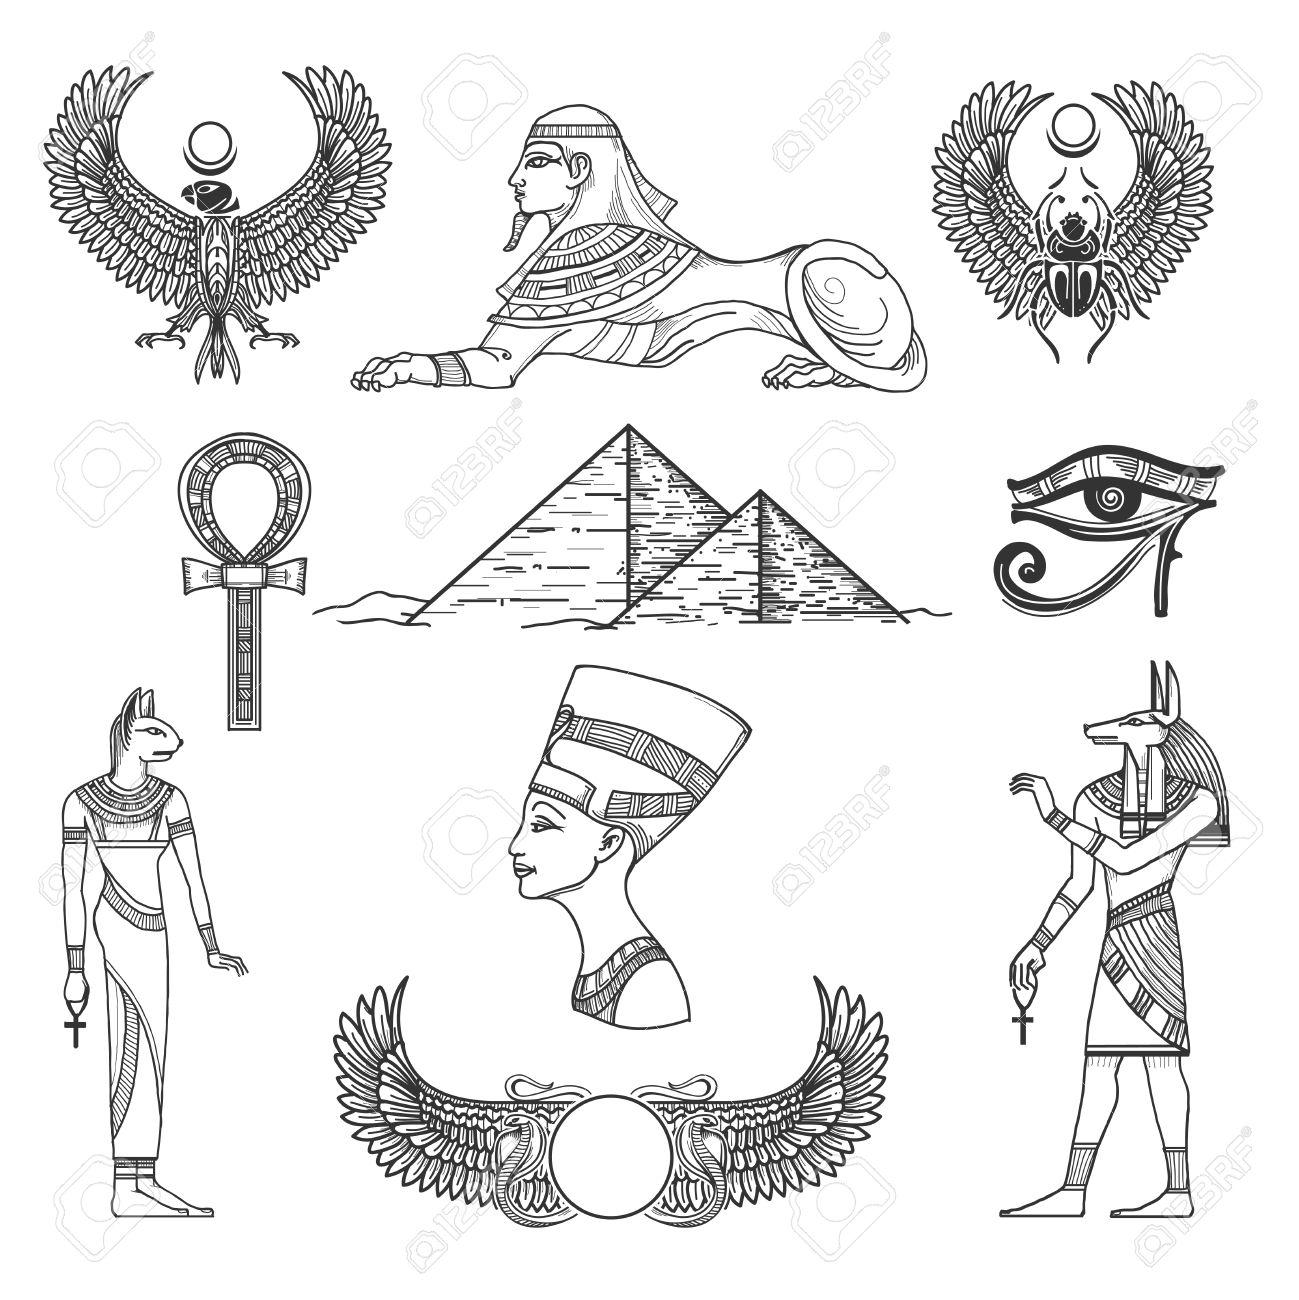 Egypt symbols culture icon character antique pyramid vector egypt symbols culture icon character antique pyramid vector illustration stock vector 51088564 buycottarizona